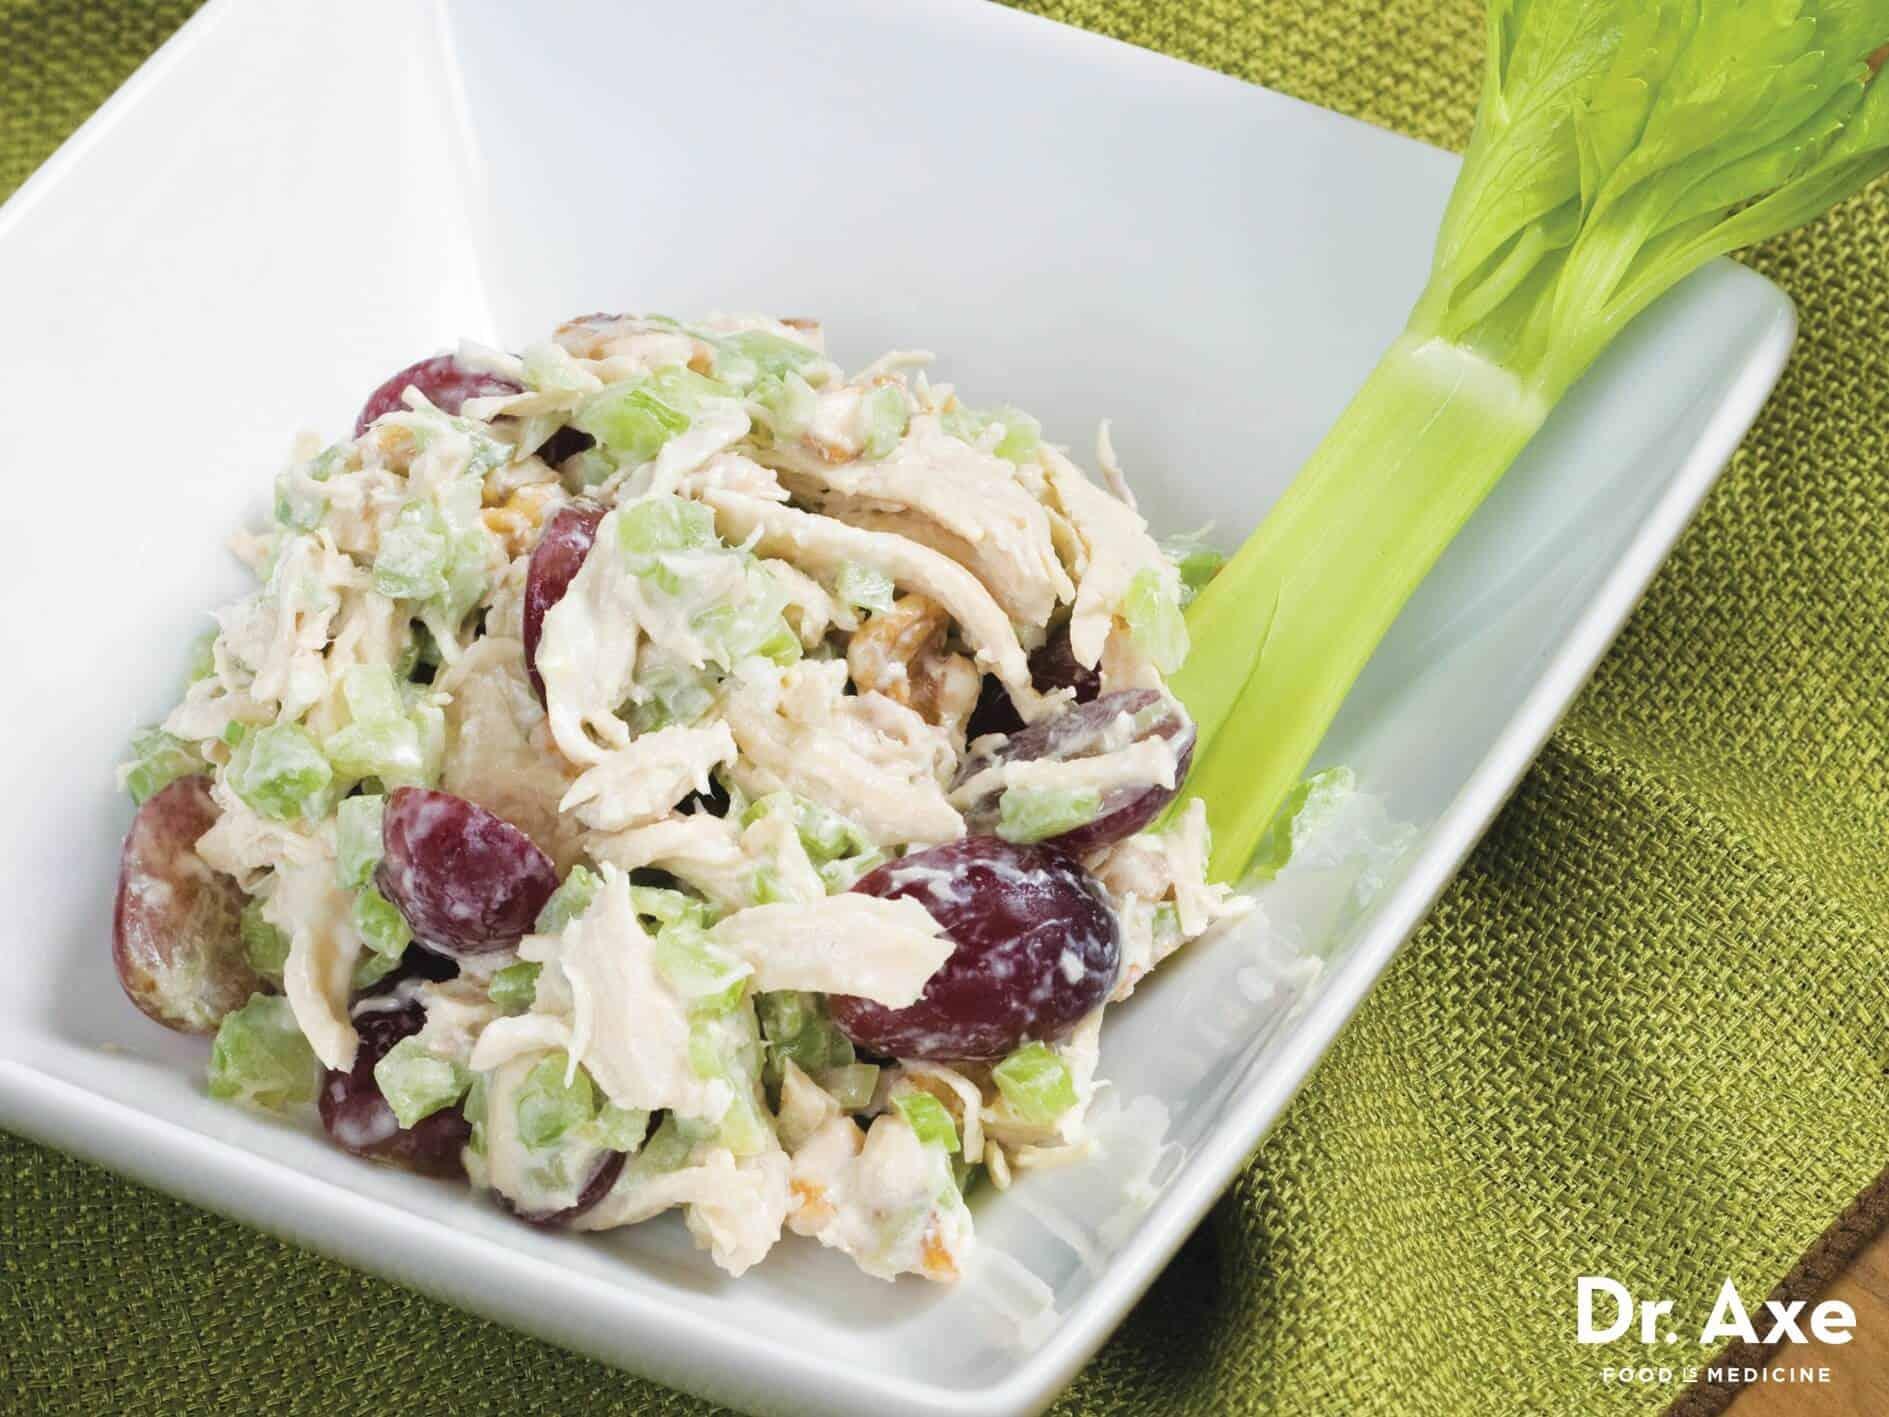 Chicken salad recipe - Dr. Axe